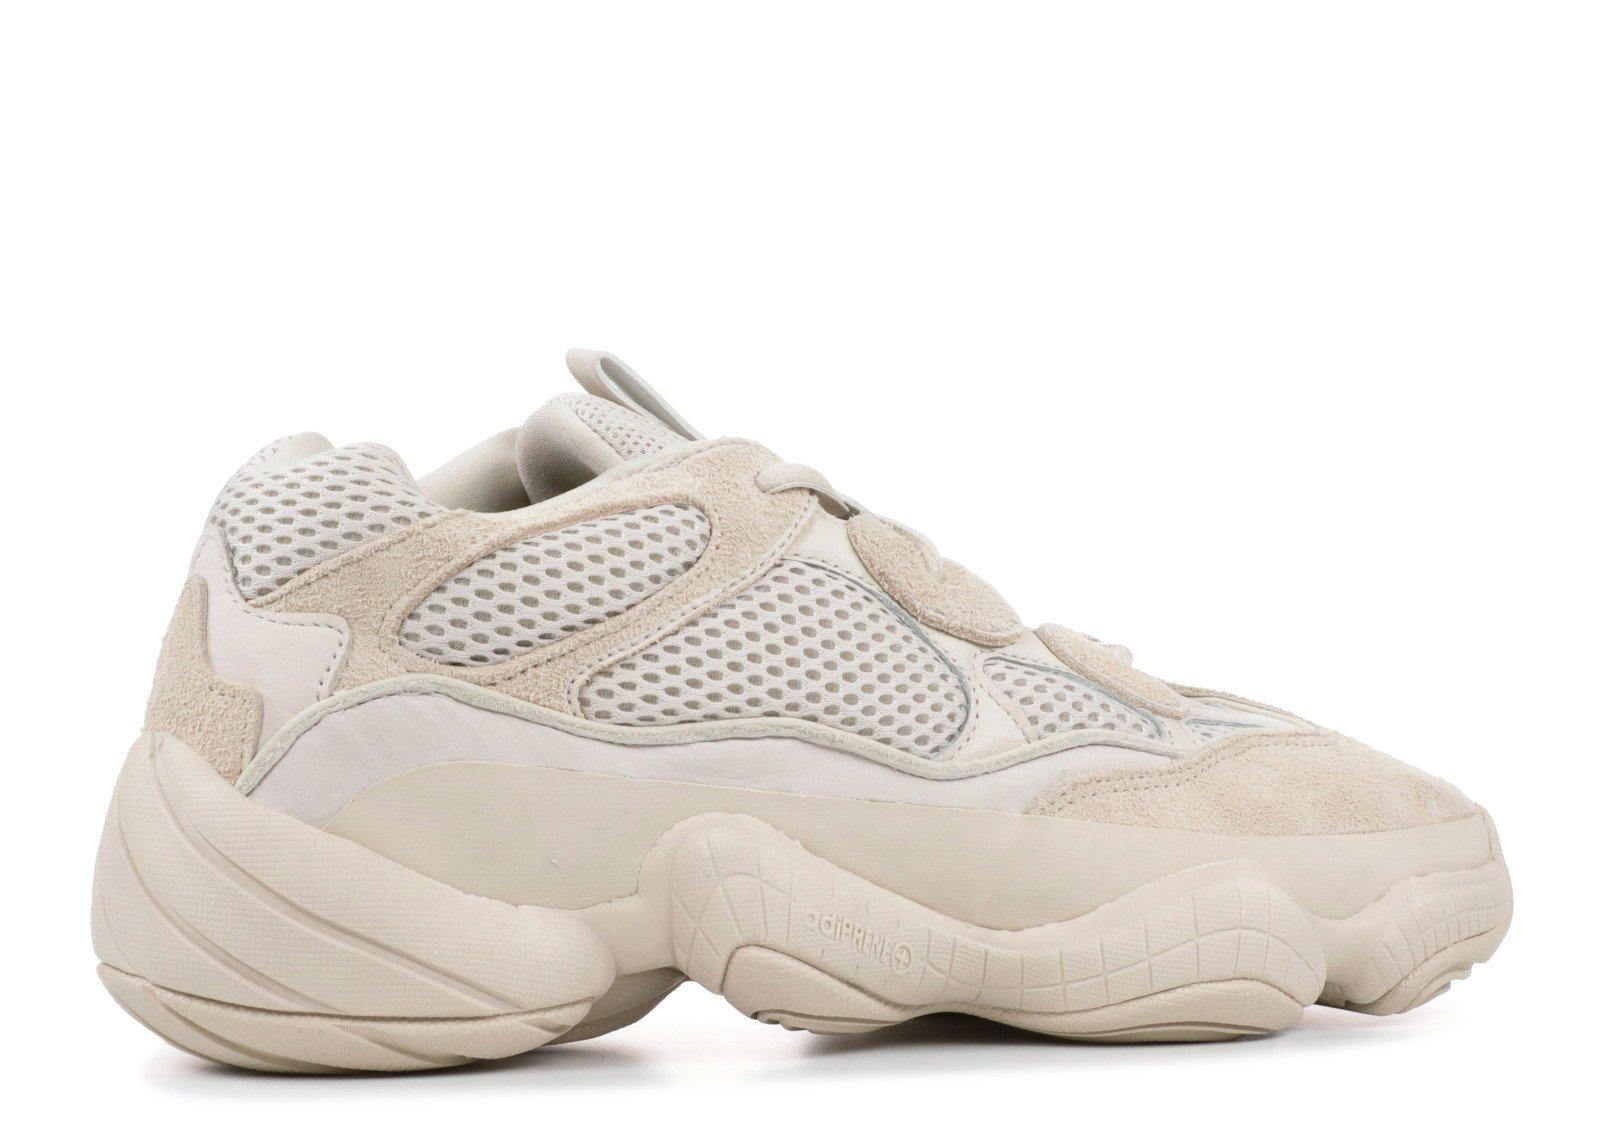 sports shoes 6304e b25d5 adidas Yeezy Desert Rat 500 'Blush' - DB2908 - Size 5.5-UK